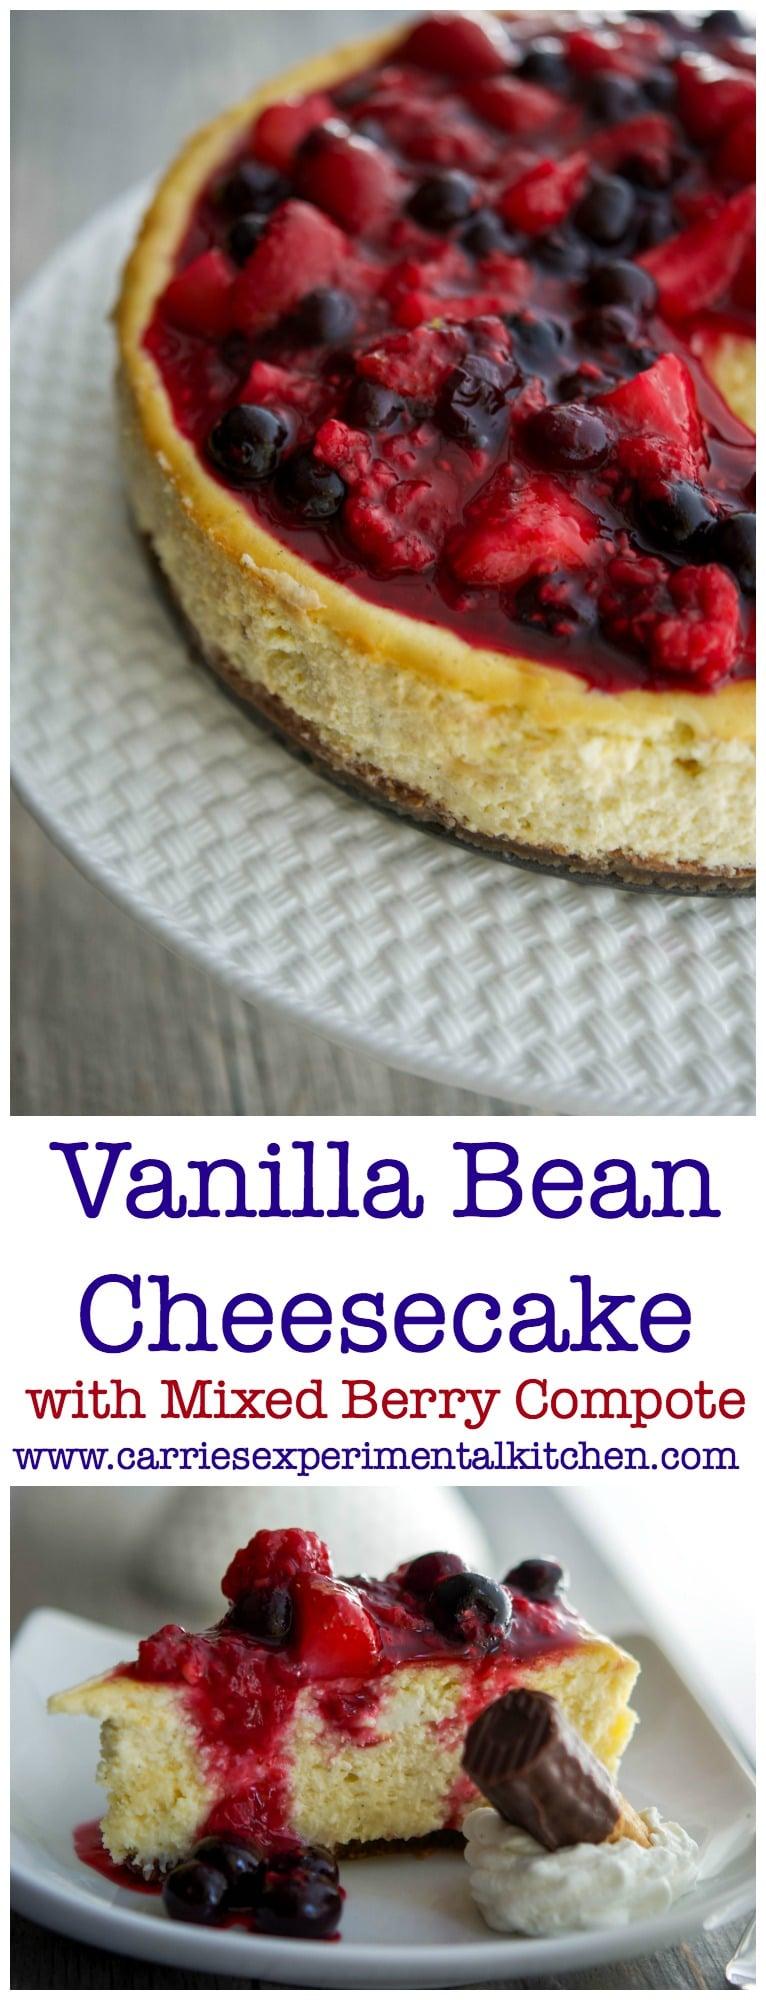 Madagascar Vanilla Bean Cake Recipe